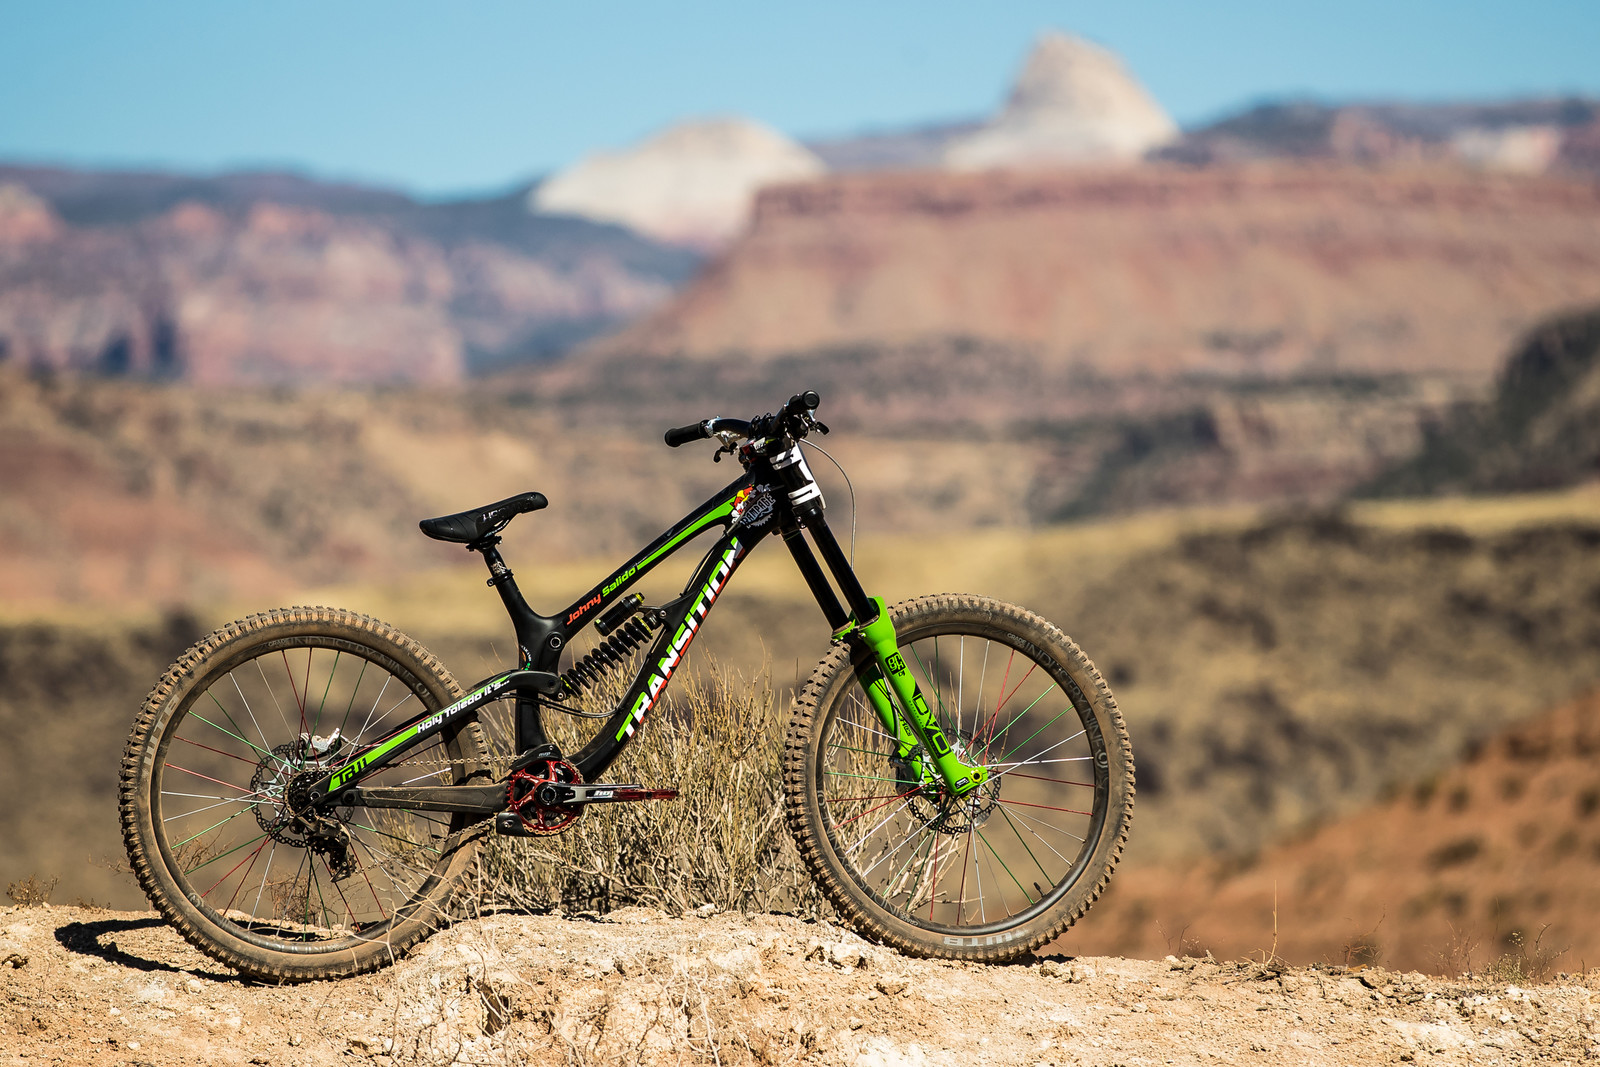 RAMPAGE BIKE - Juan Diego Salido's Transition TR11 - RAMPAGE BIKE - Juan Diego Salido's Transition TR11 - Mountain Biking Pictures - Vital MTB